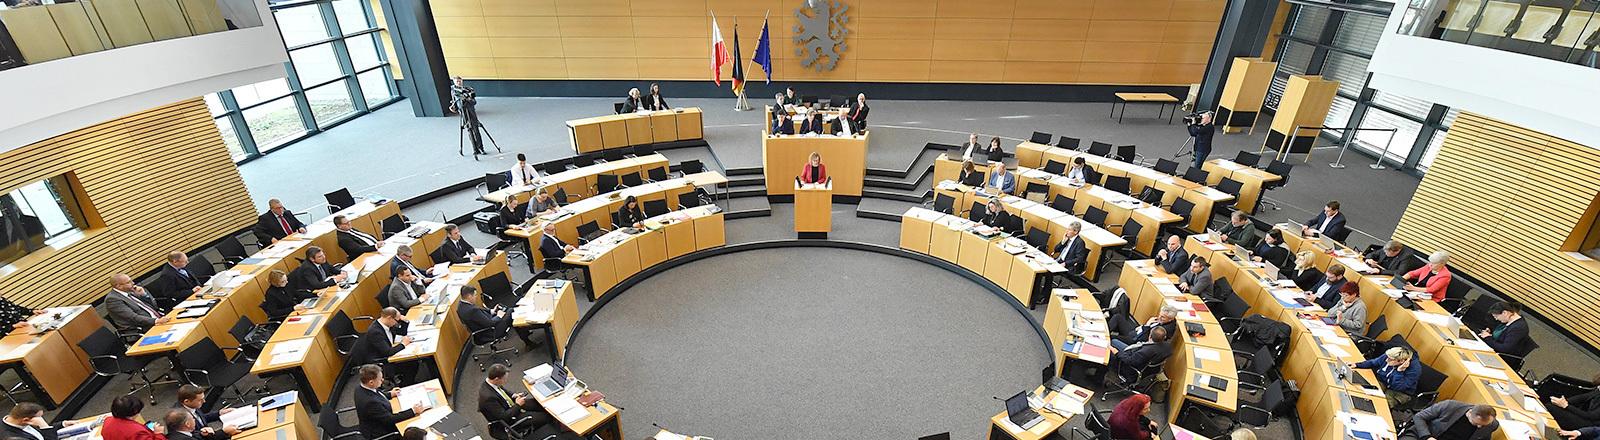 Blick in den thüringischen Landtag